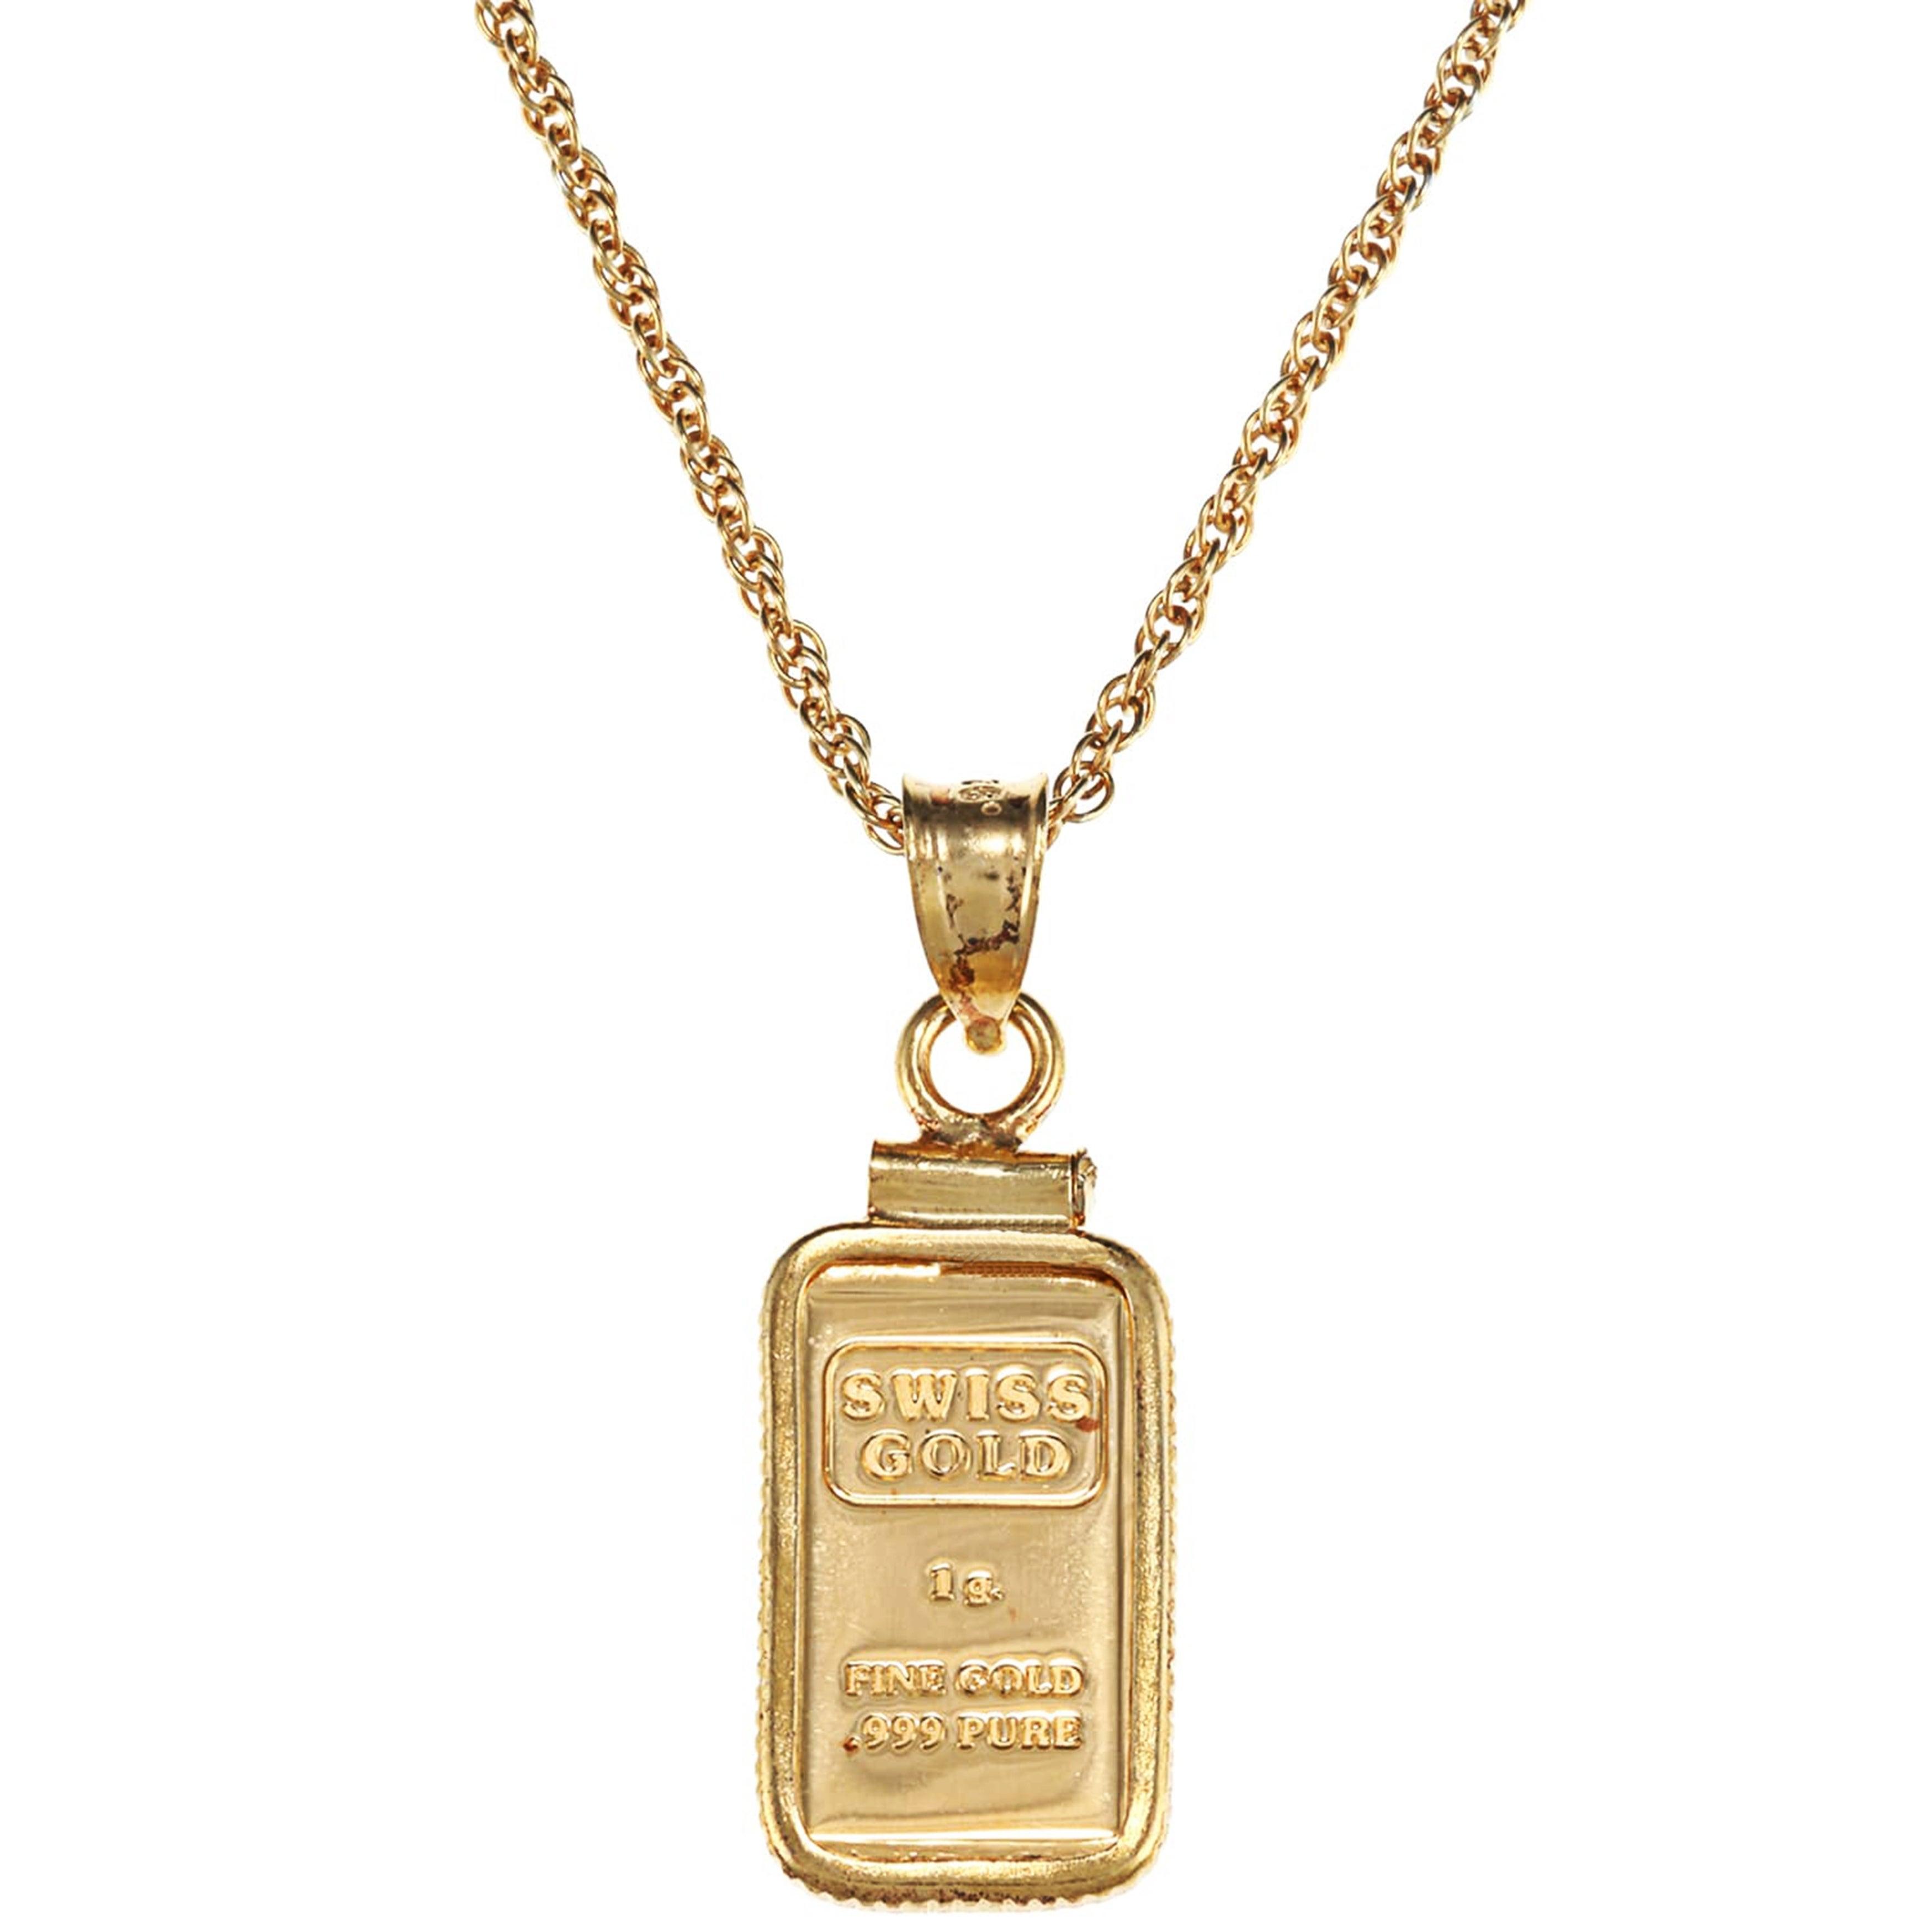 American coin treasures 1 gram gold ingot pendant necklace american coin treasures 1 gram gold ingot pendant necklace aloadofball Images